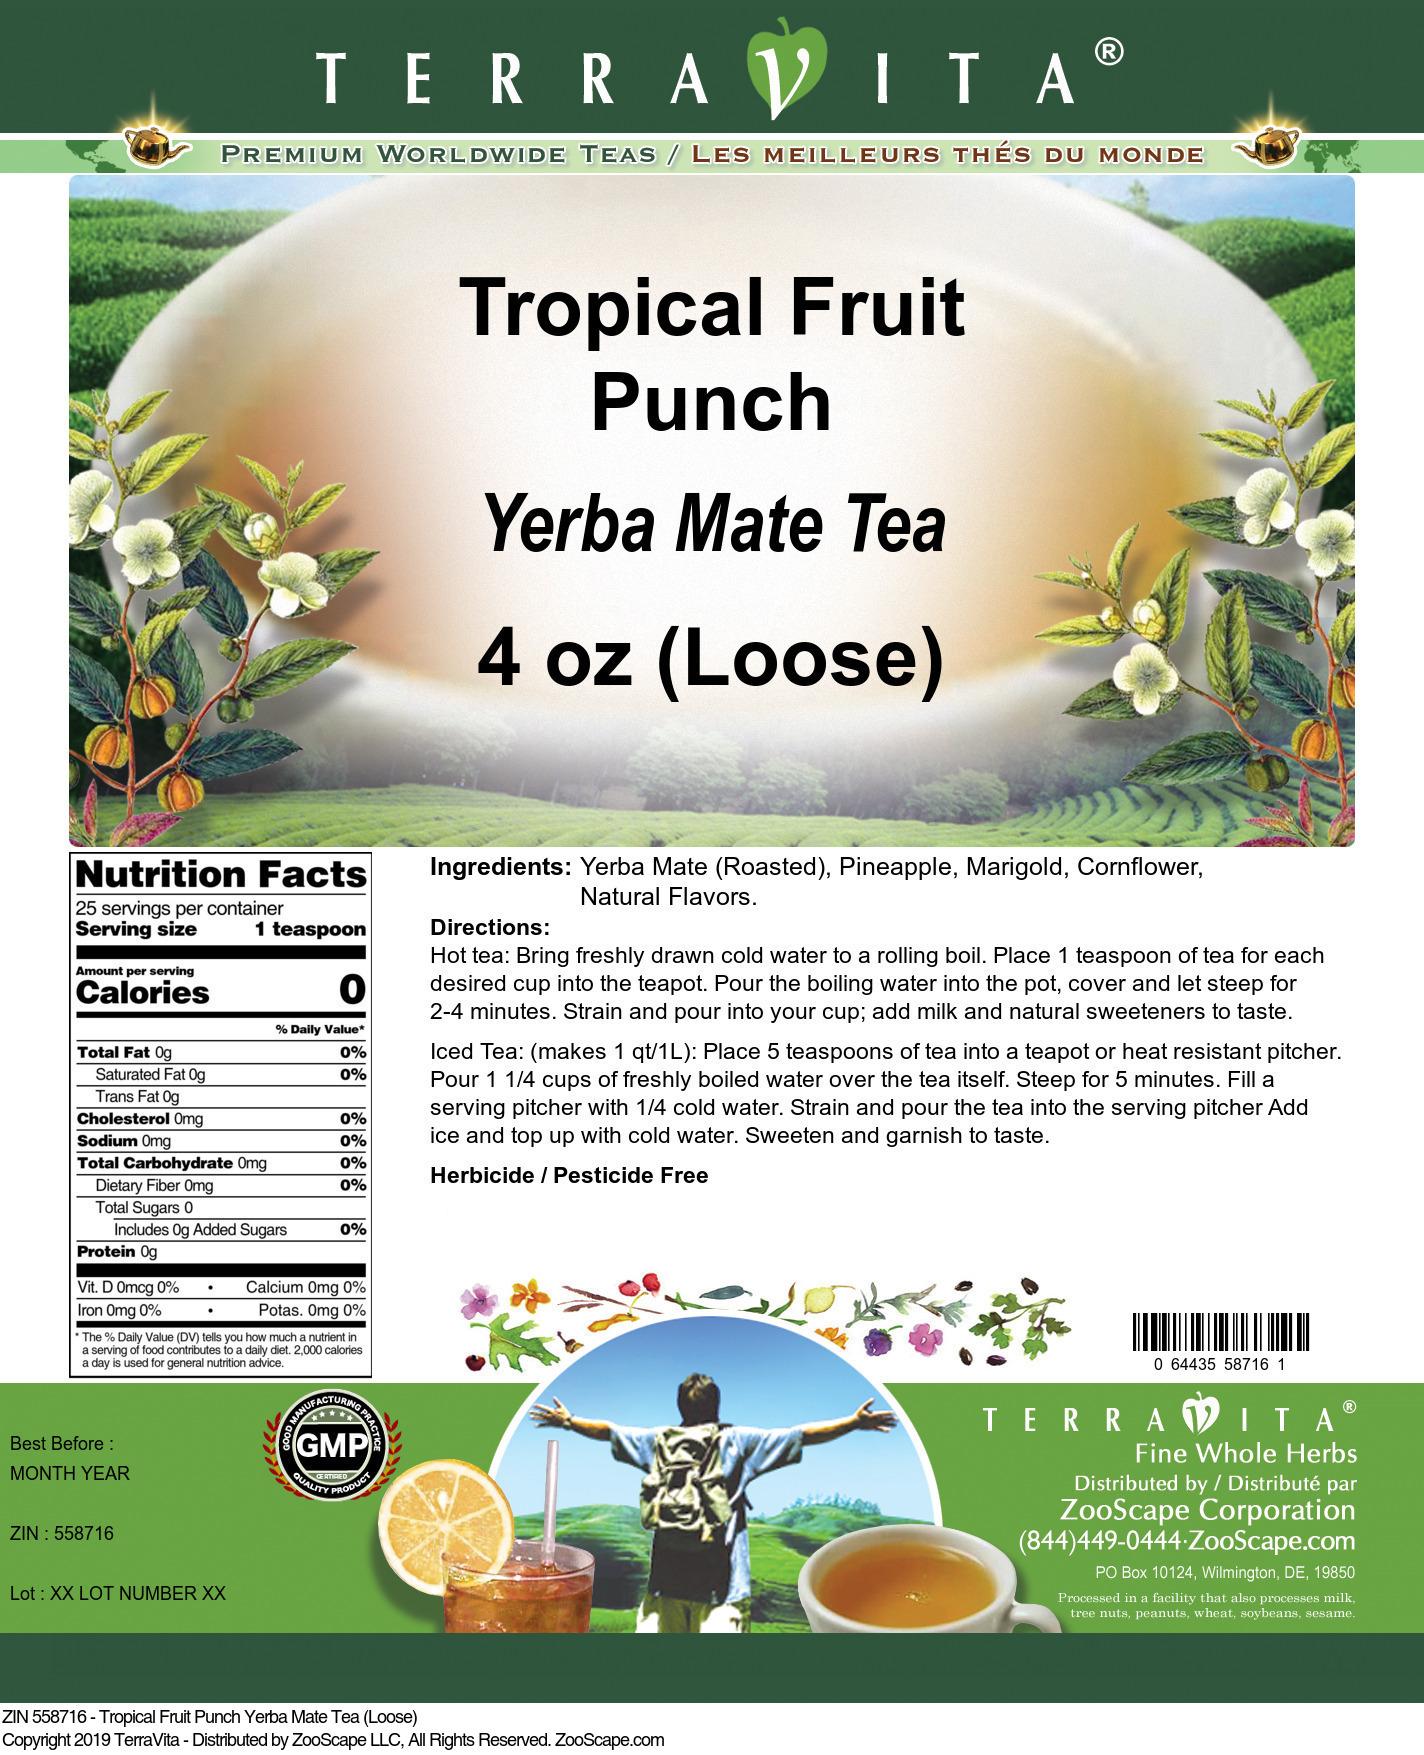 Tropical Fruit Punch Yerba Mate